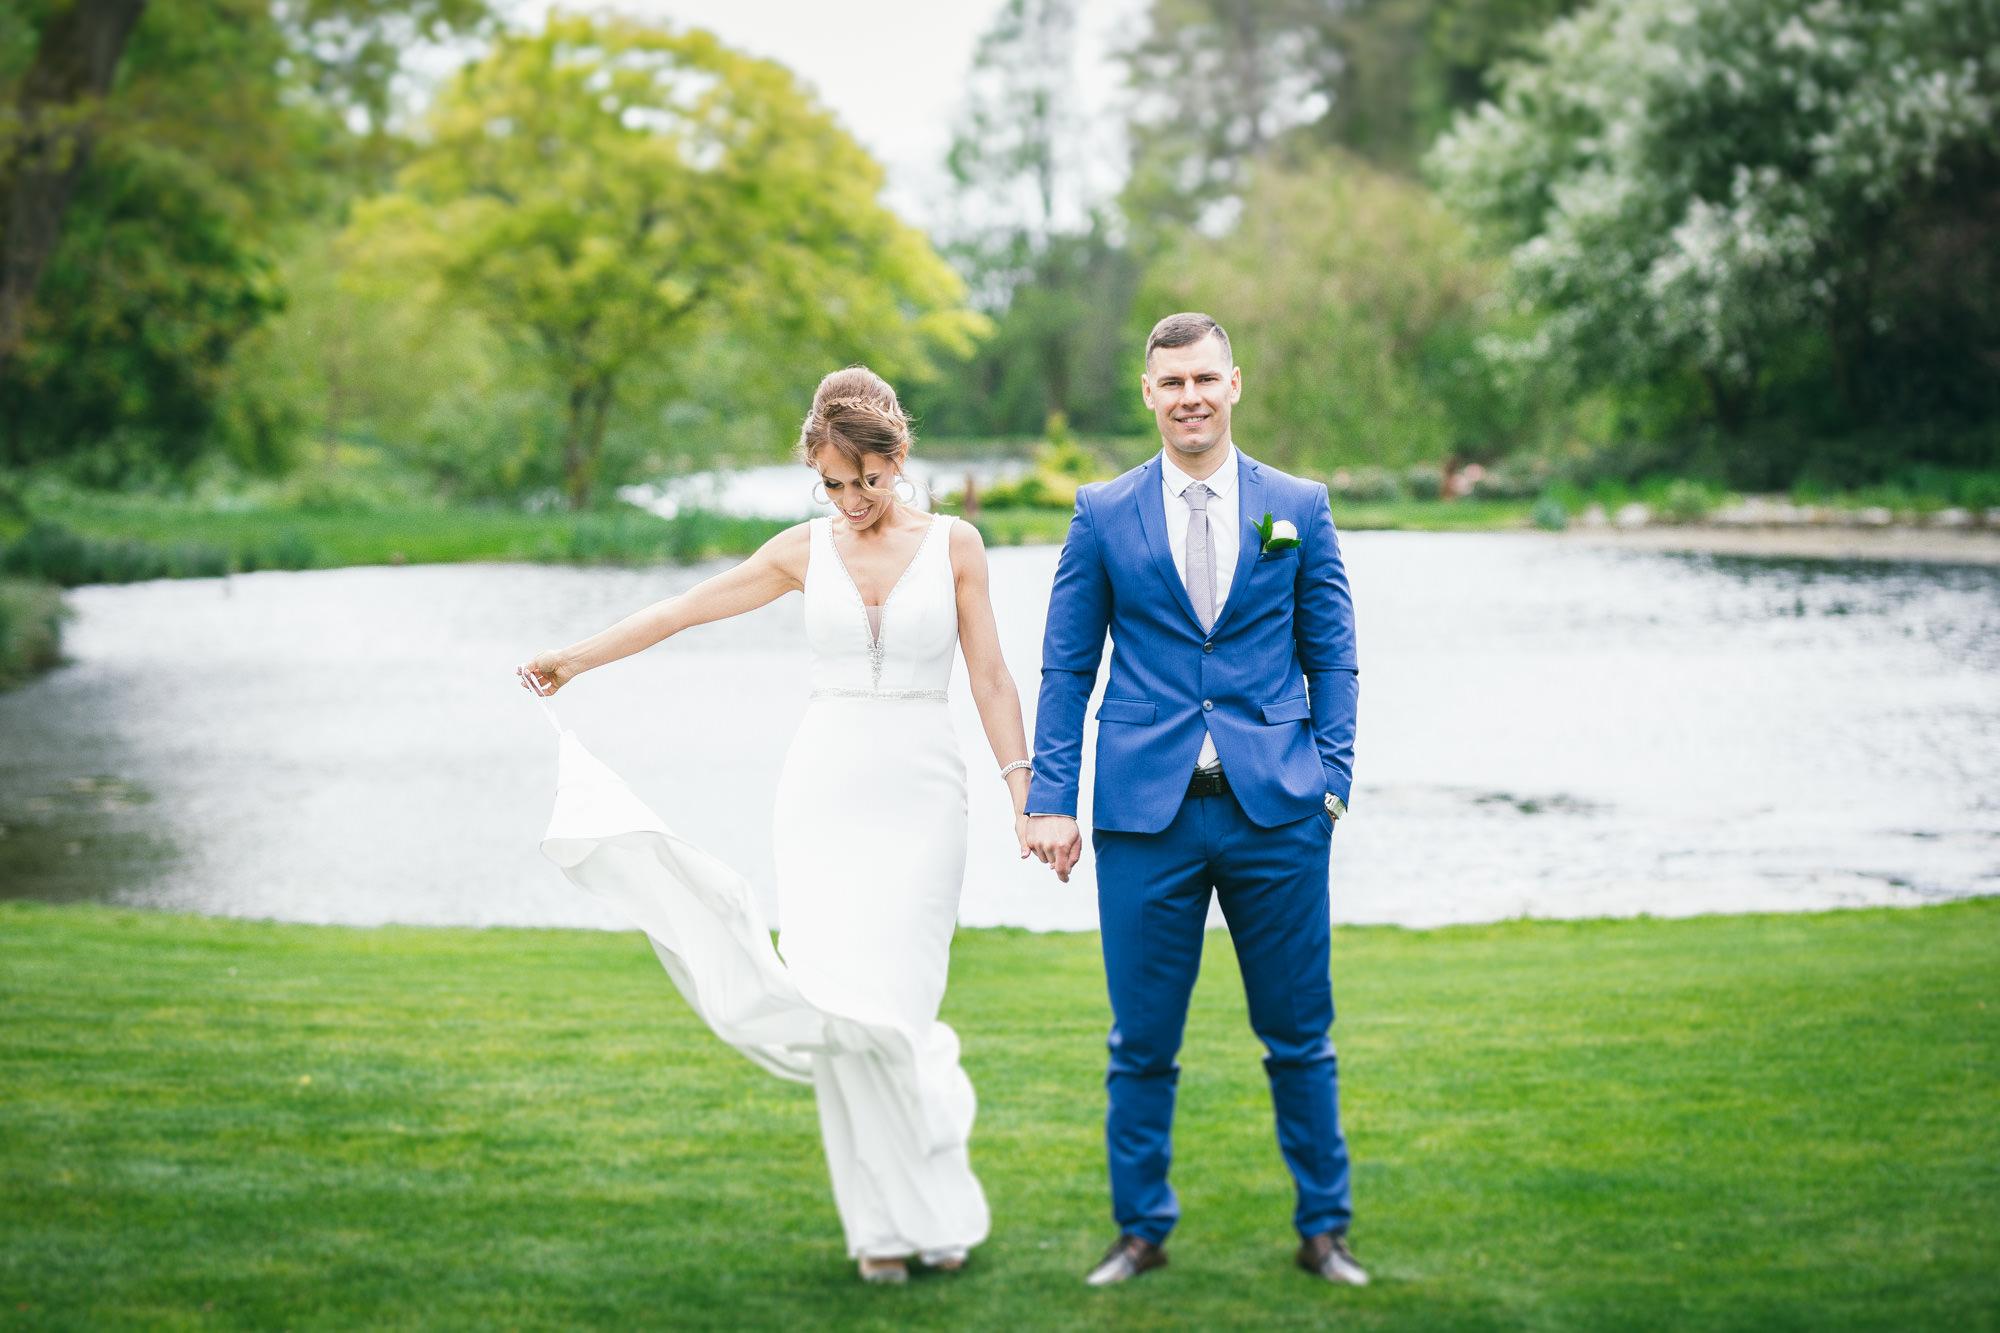 Bride and Groom outdoor natural light portrait Ieva Vilcinskaite Photography